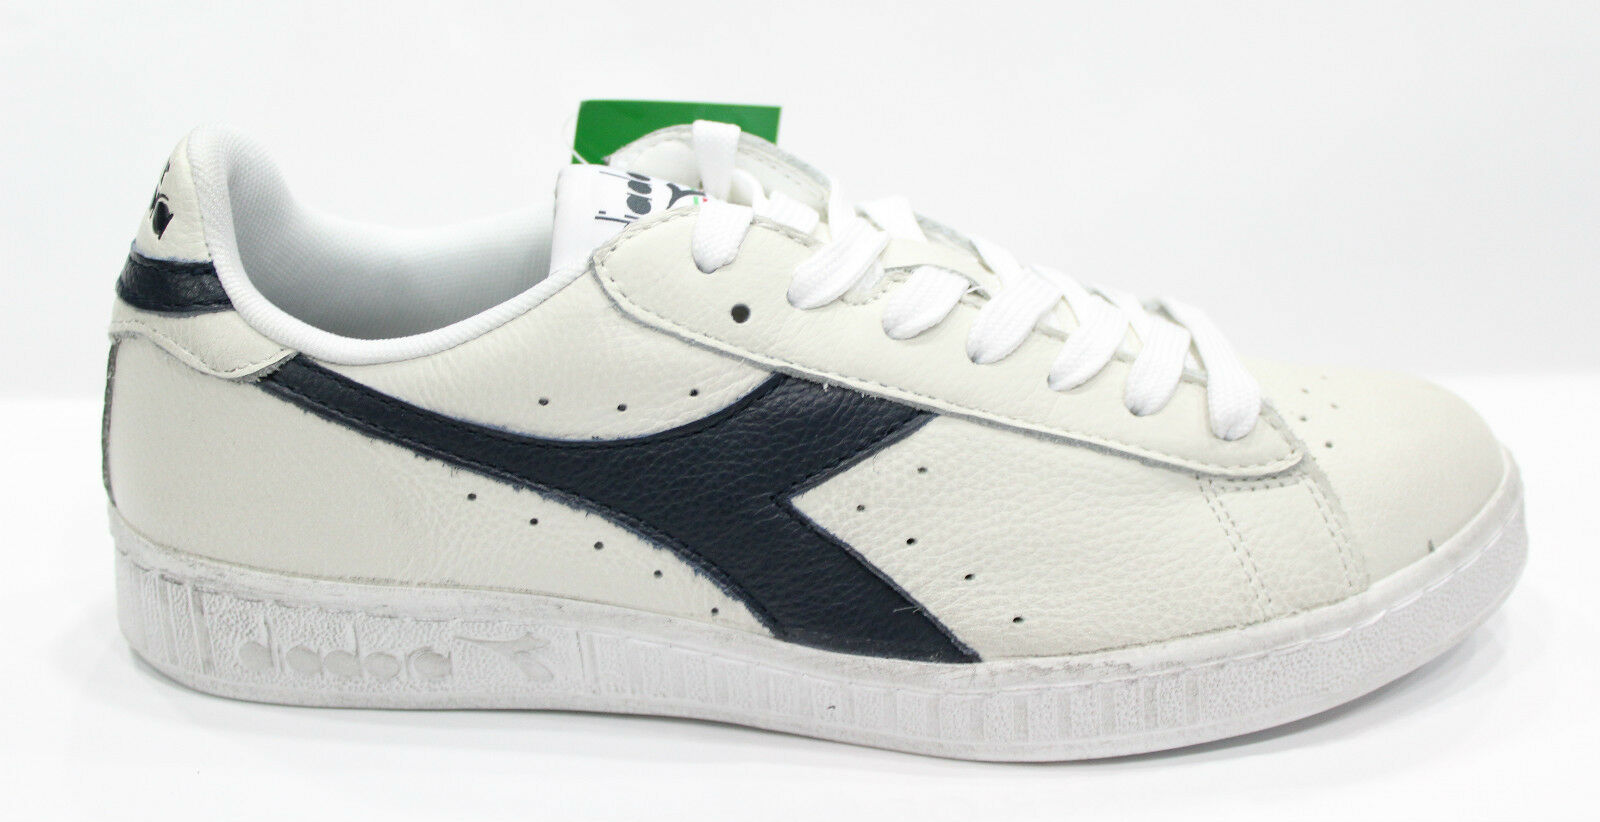 Scarpe Sneakers Diadora GAME L Shoes Sneakers Scarpe basse Unisex White Blu tomaia in pelle aa21ae